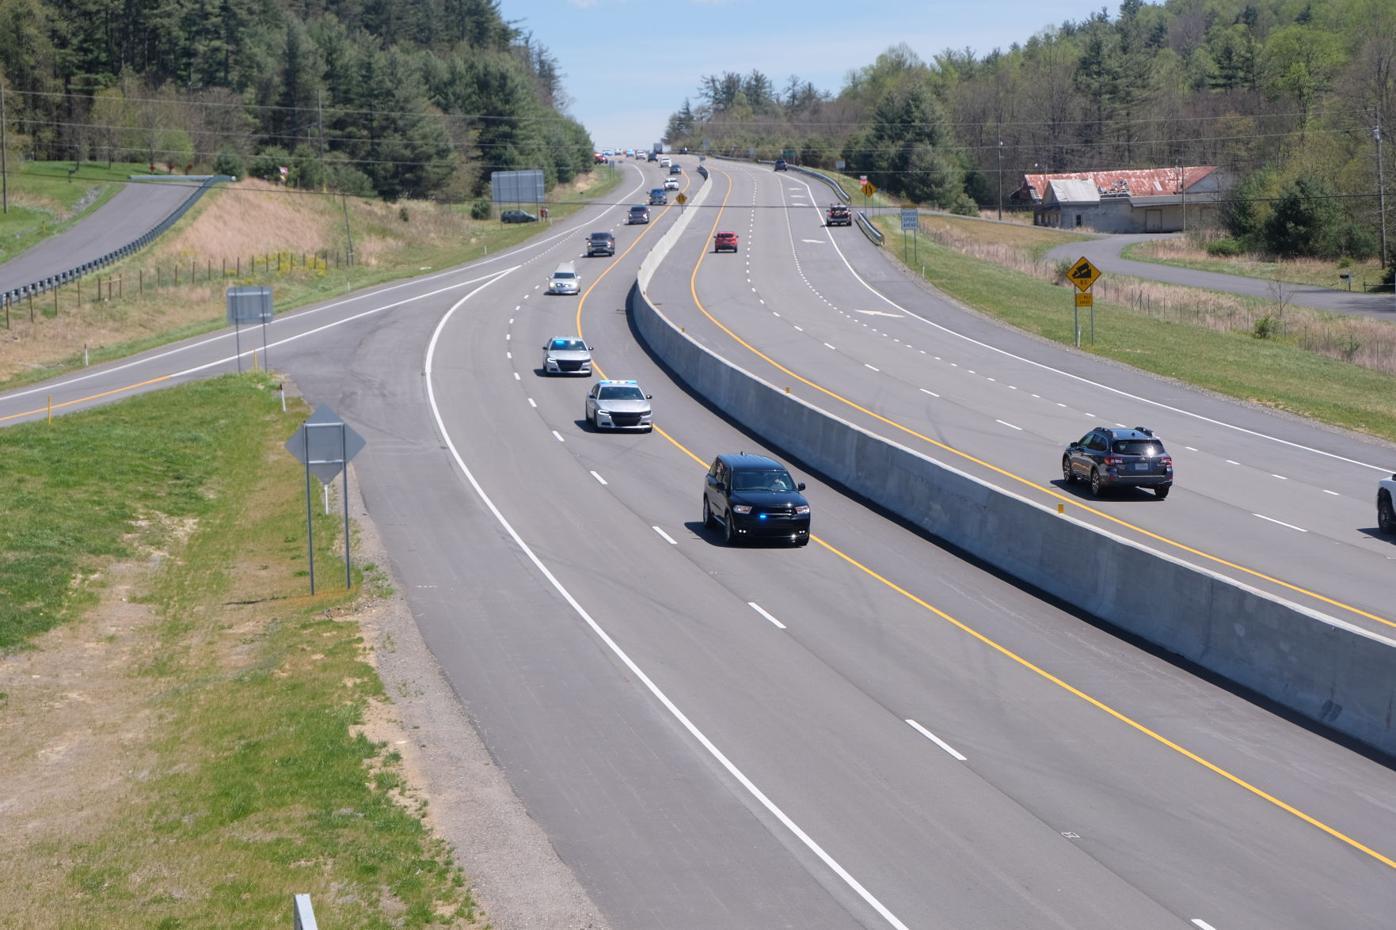 Motorcade rides into Boone